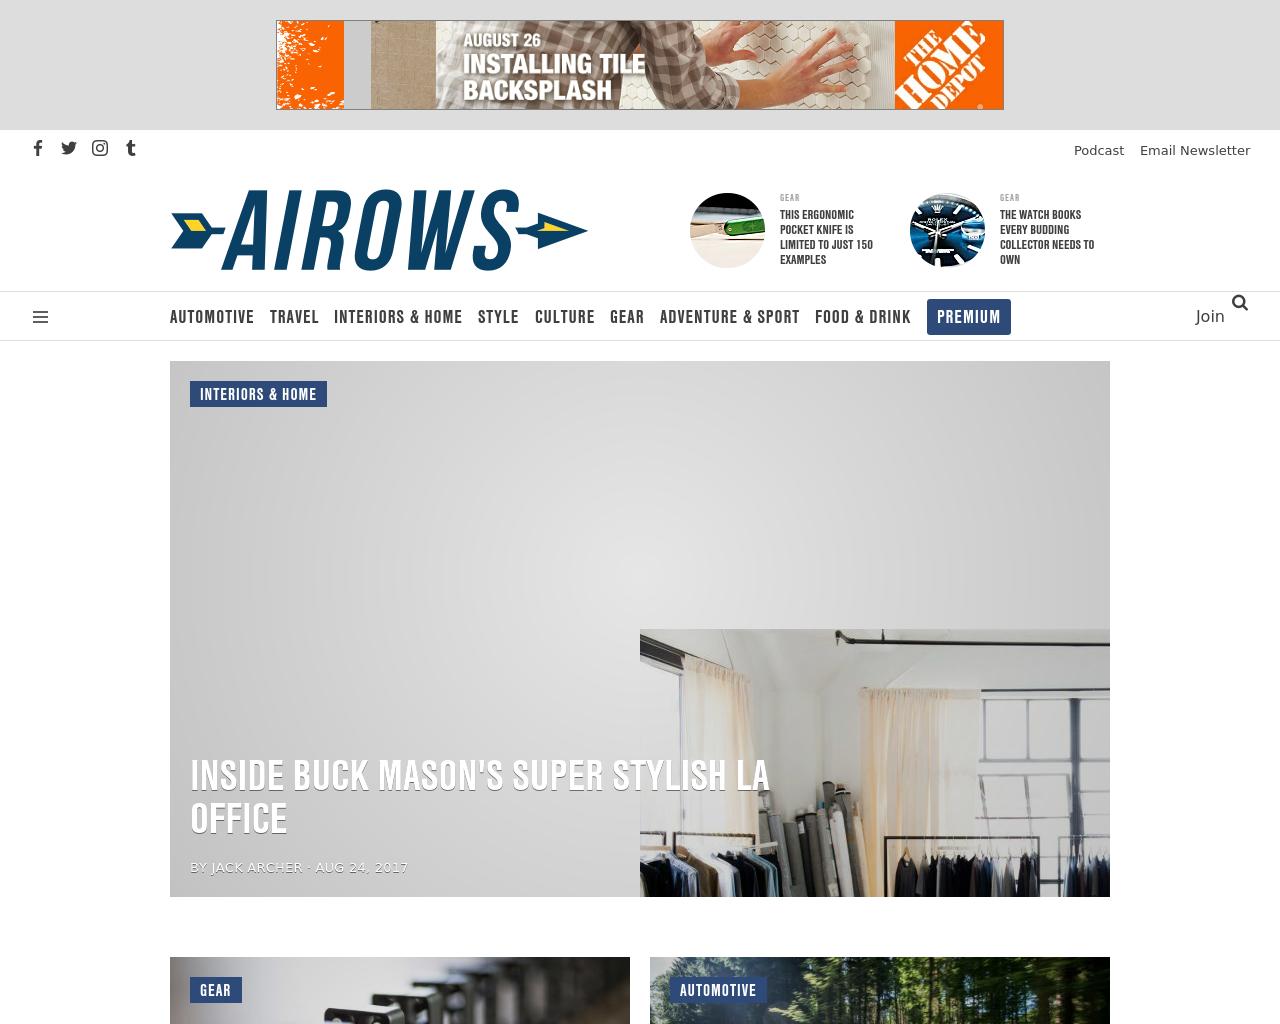 Airows-Advertising-Reviews-Pricing